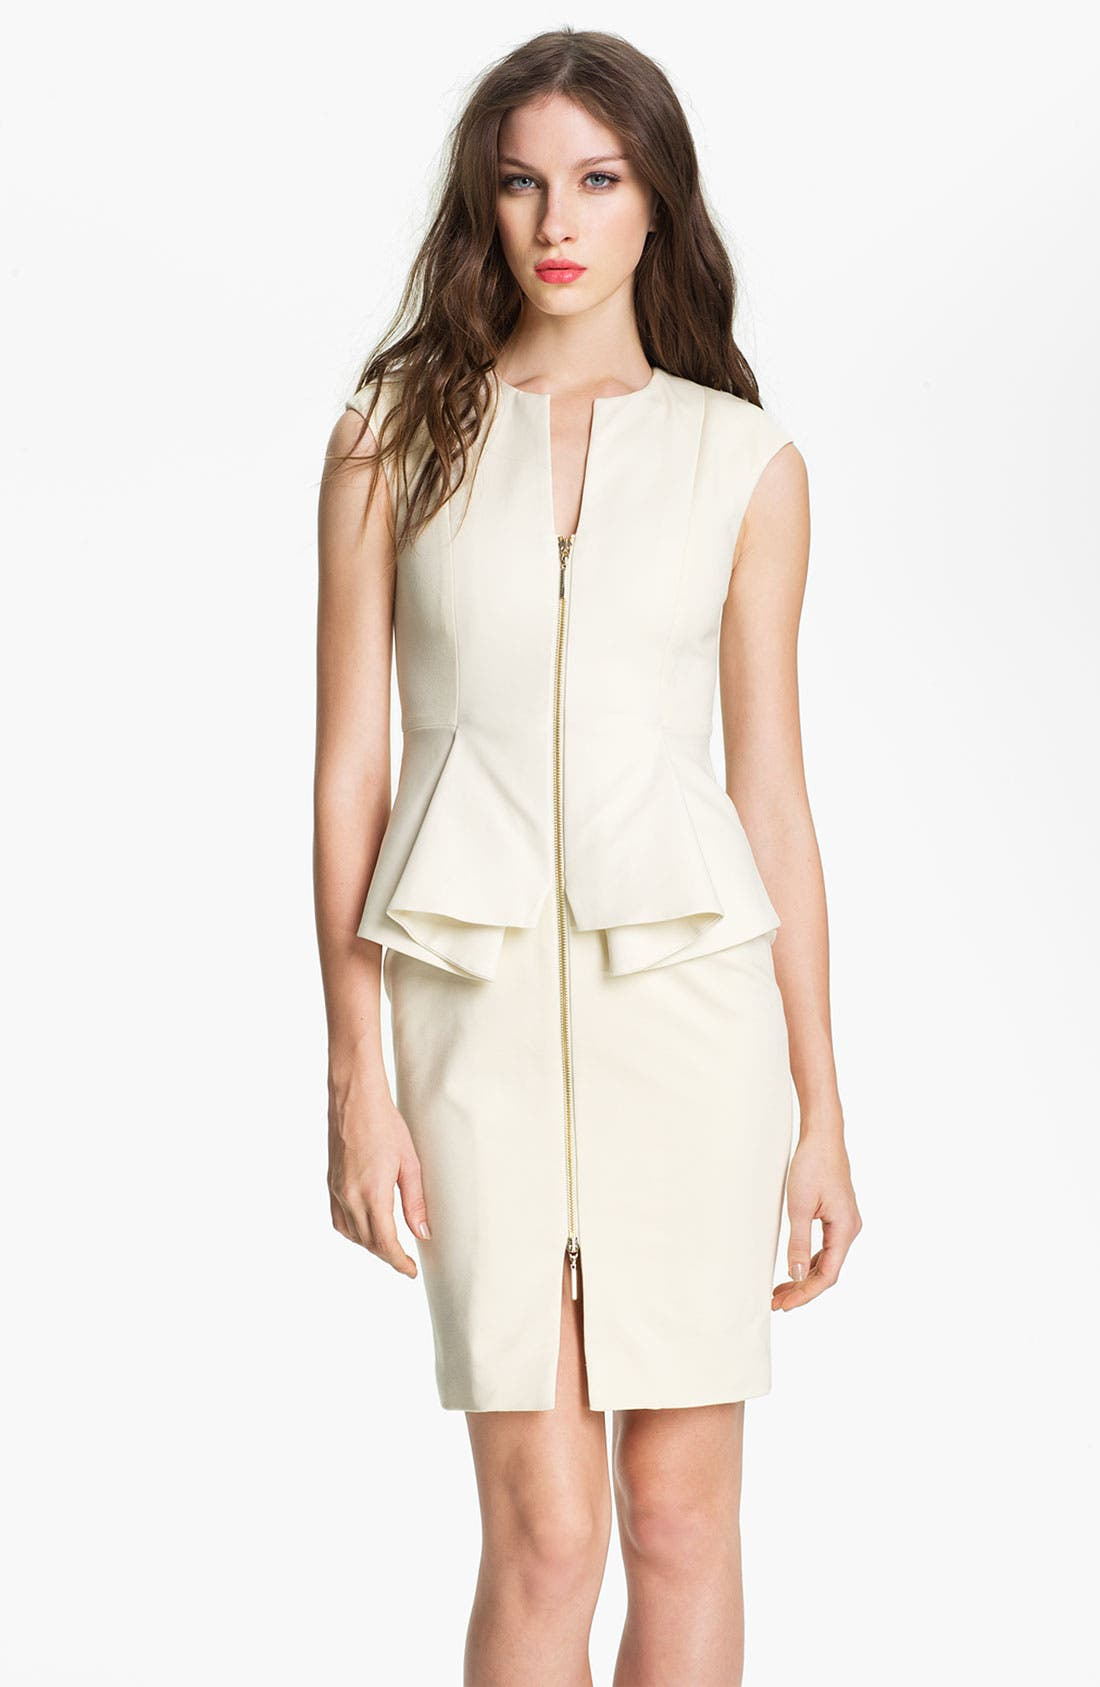 Main Image - Ted Baker London Cotton Blend Sheath Dress